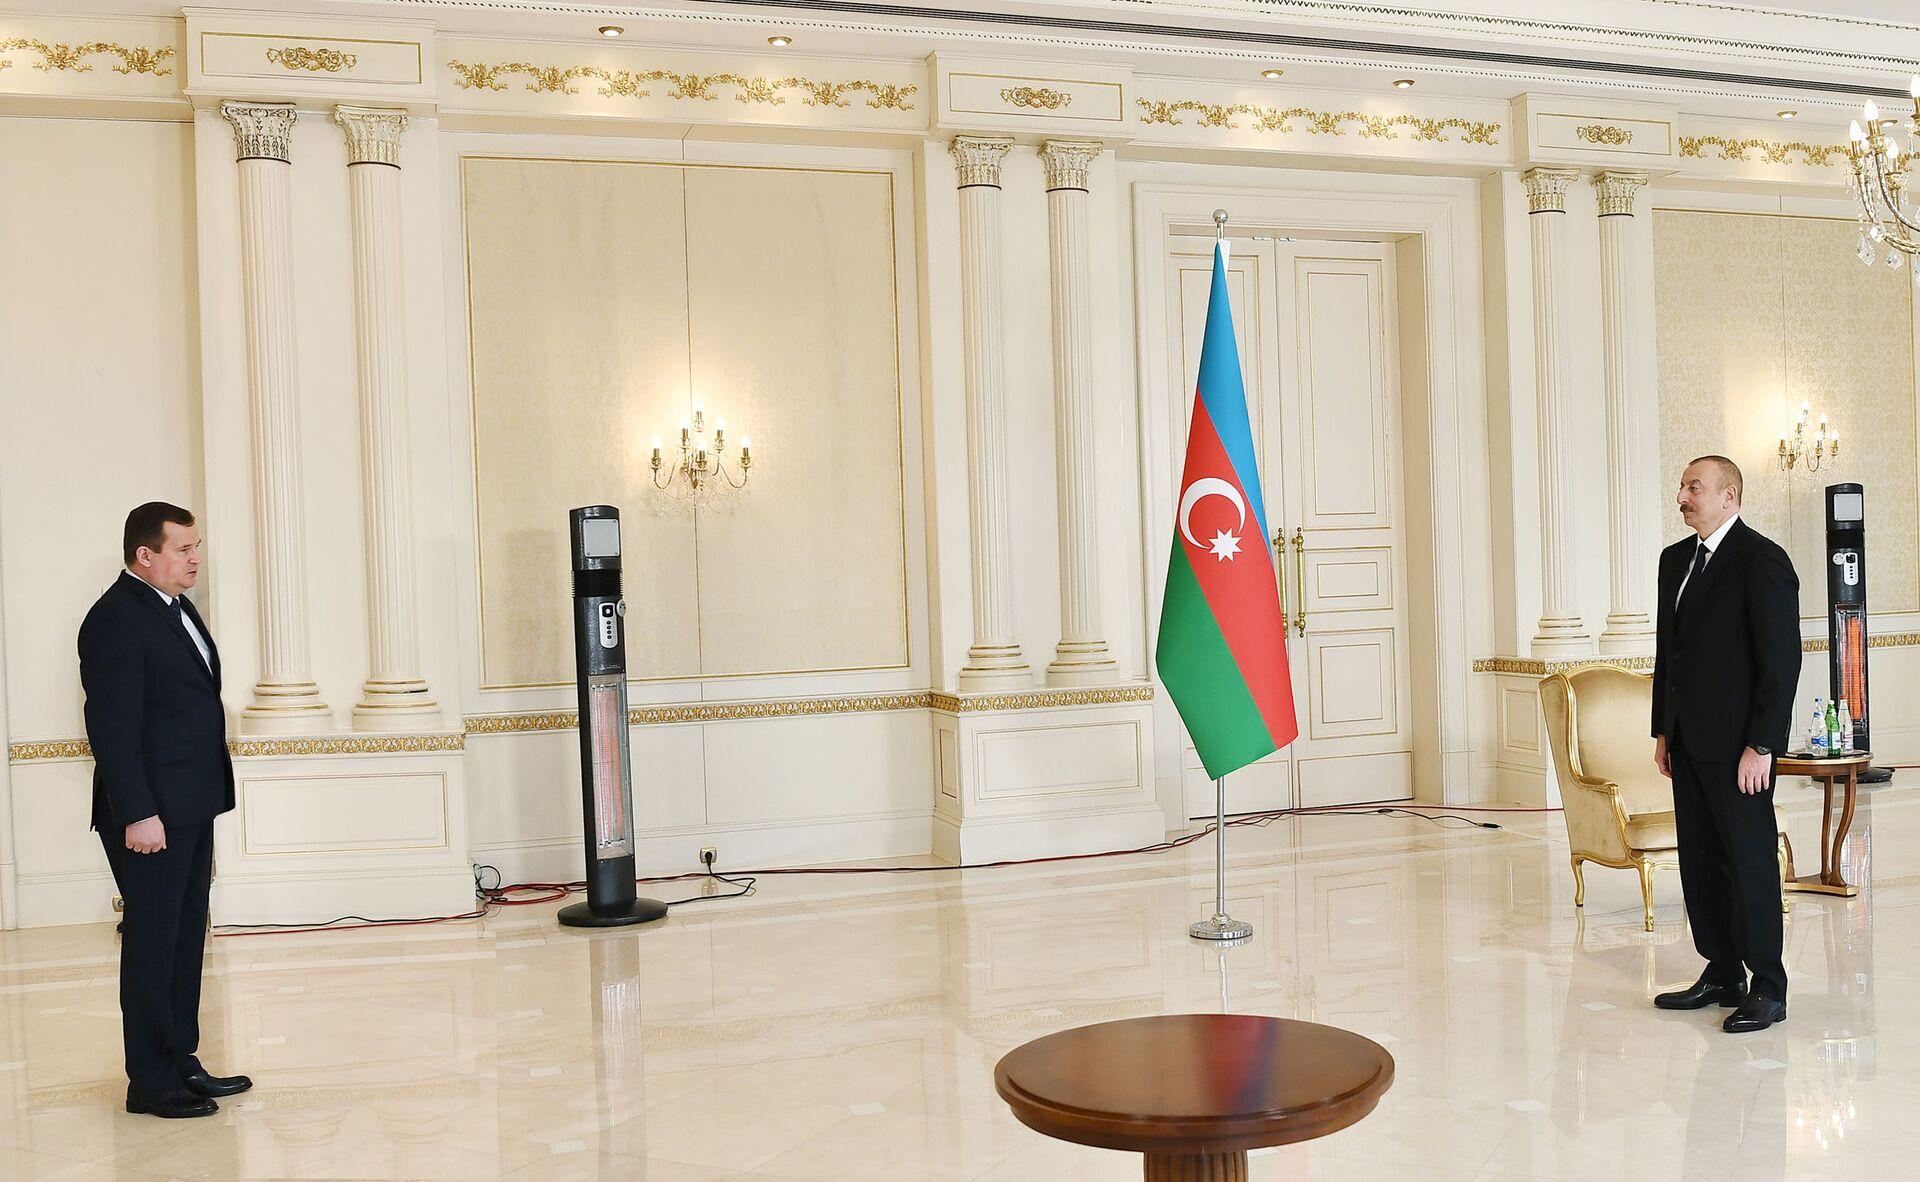 Президент Алиев принял новоназначенного посла Беларуси - Sputnik Азербайджан, 1920, 16.02.2021